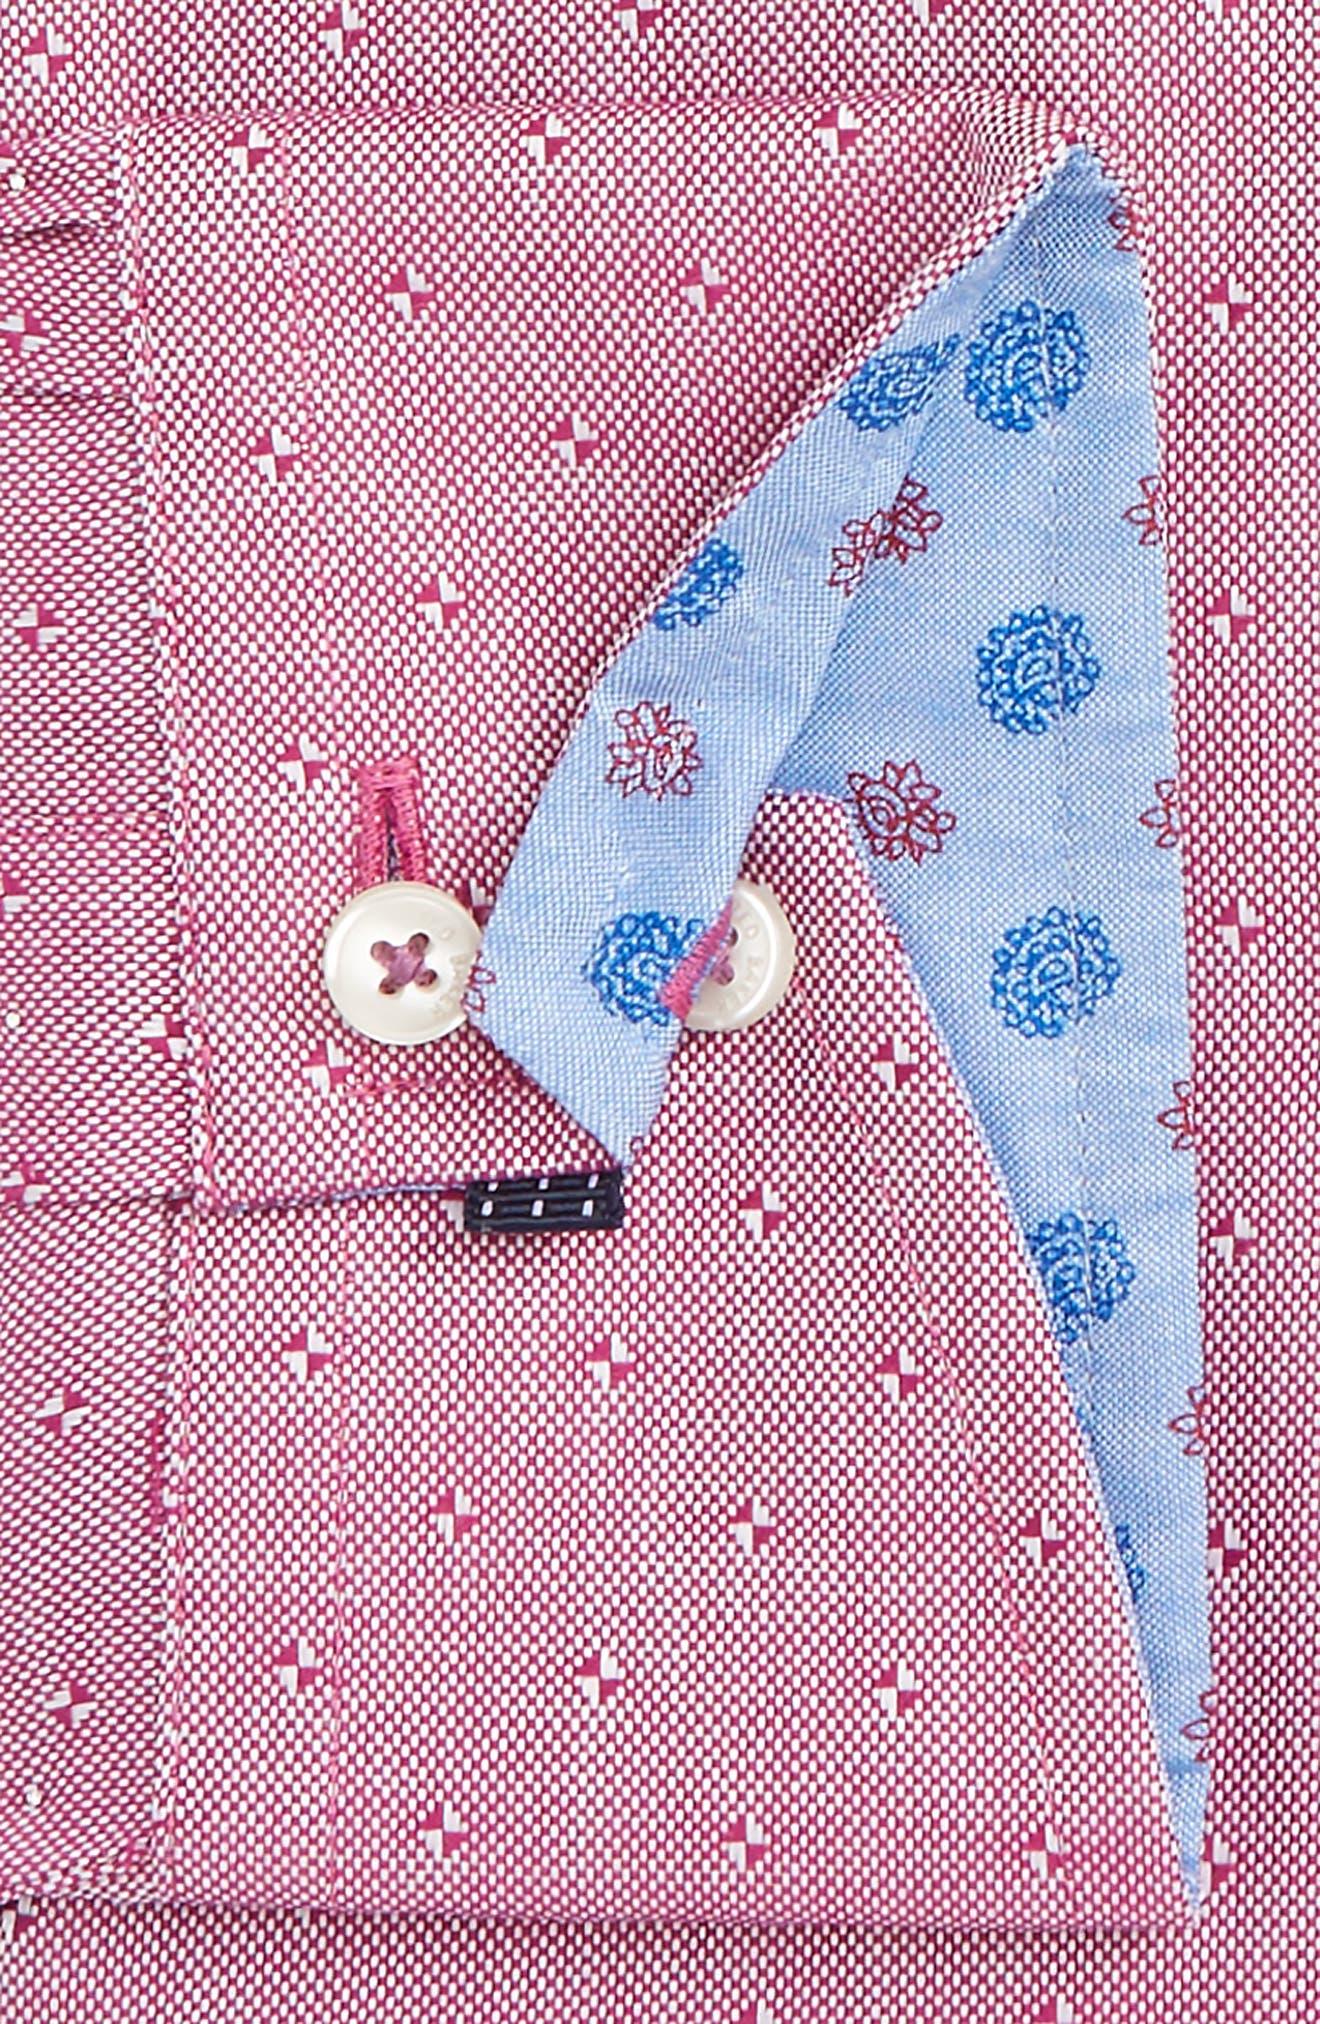 Jamer Trim Fit Dot Dress Shirt,                             Alternate thumbnail 2, color,                             611